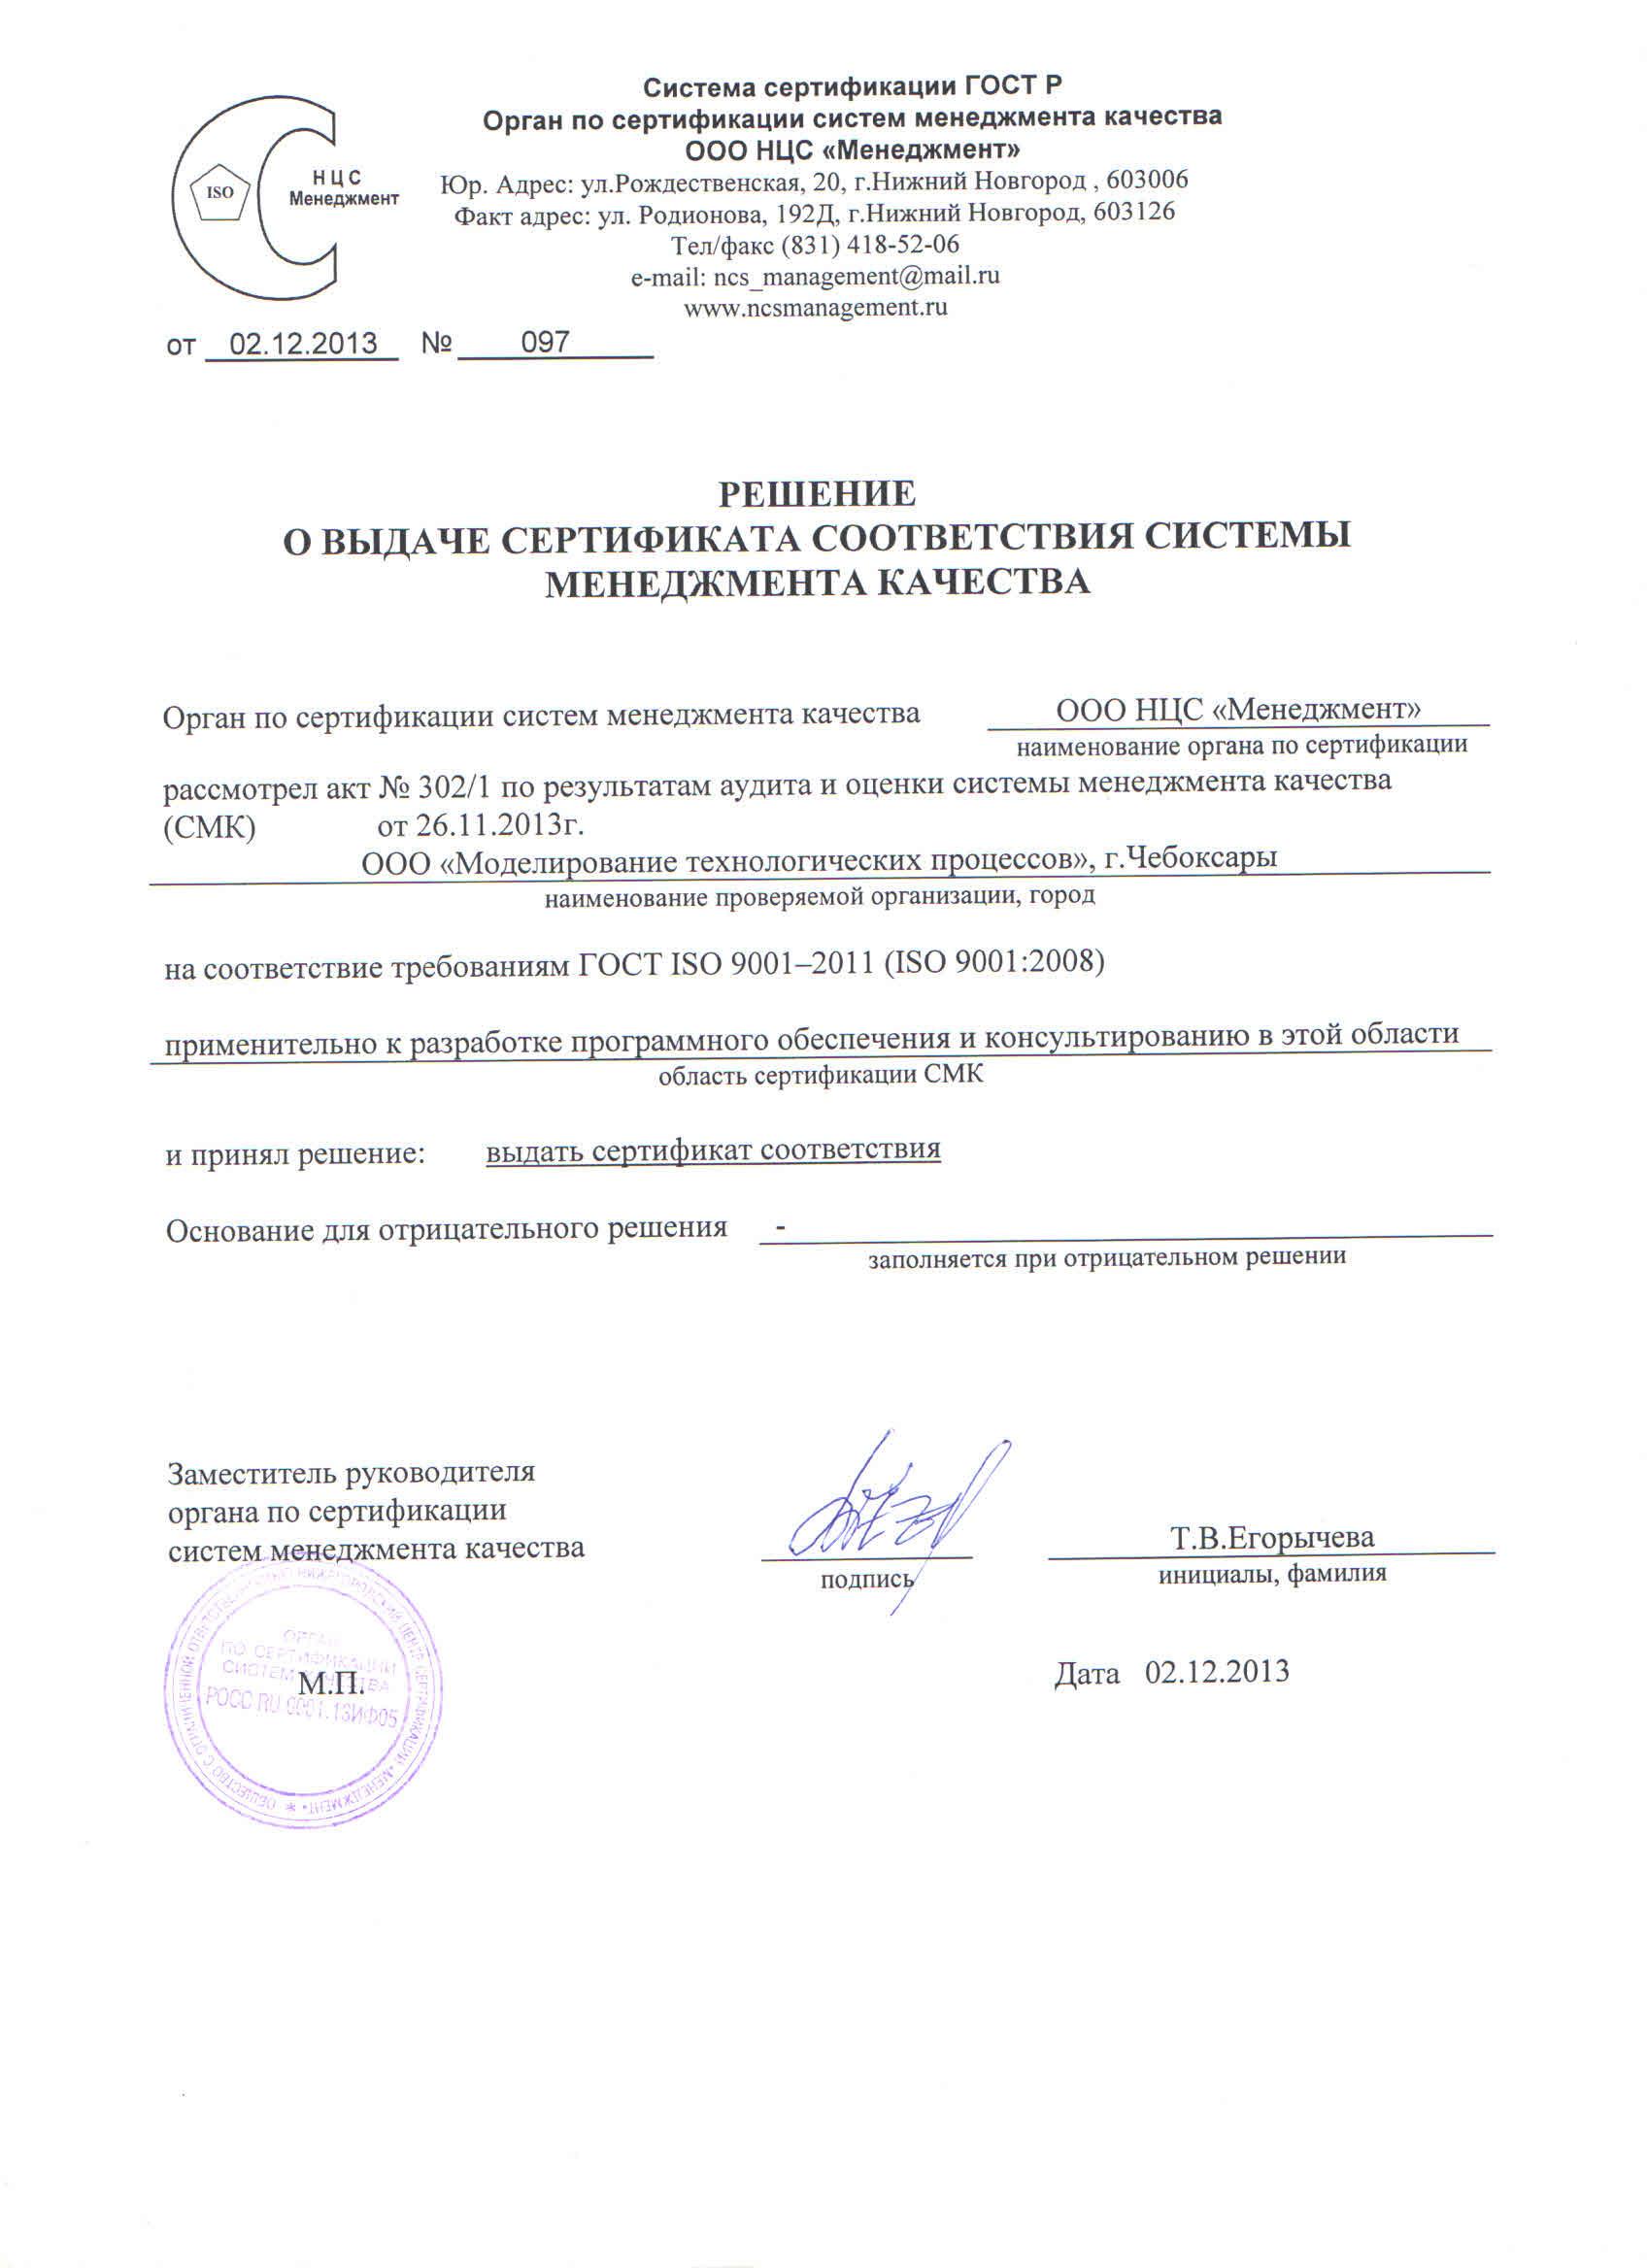 Решение органа сертификации